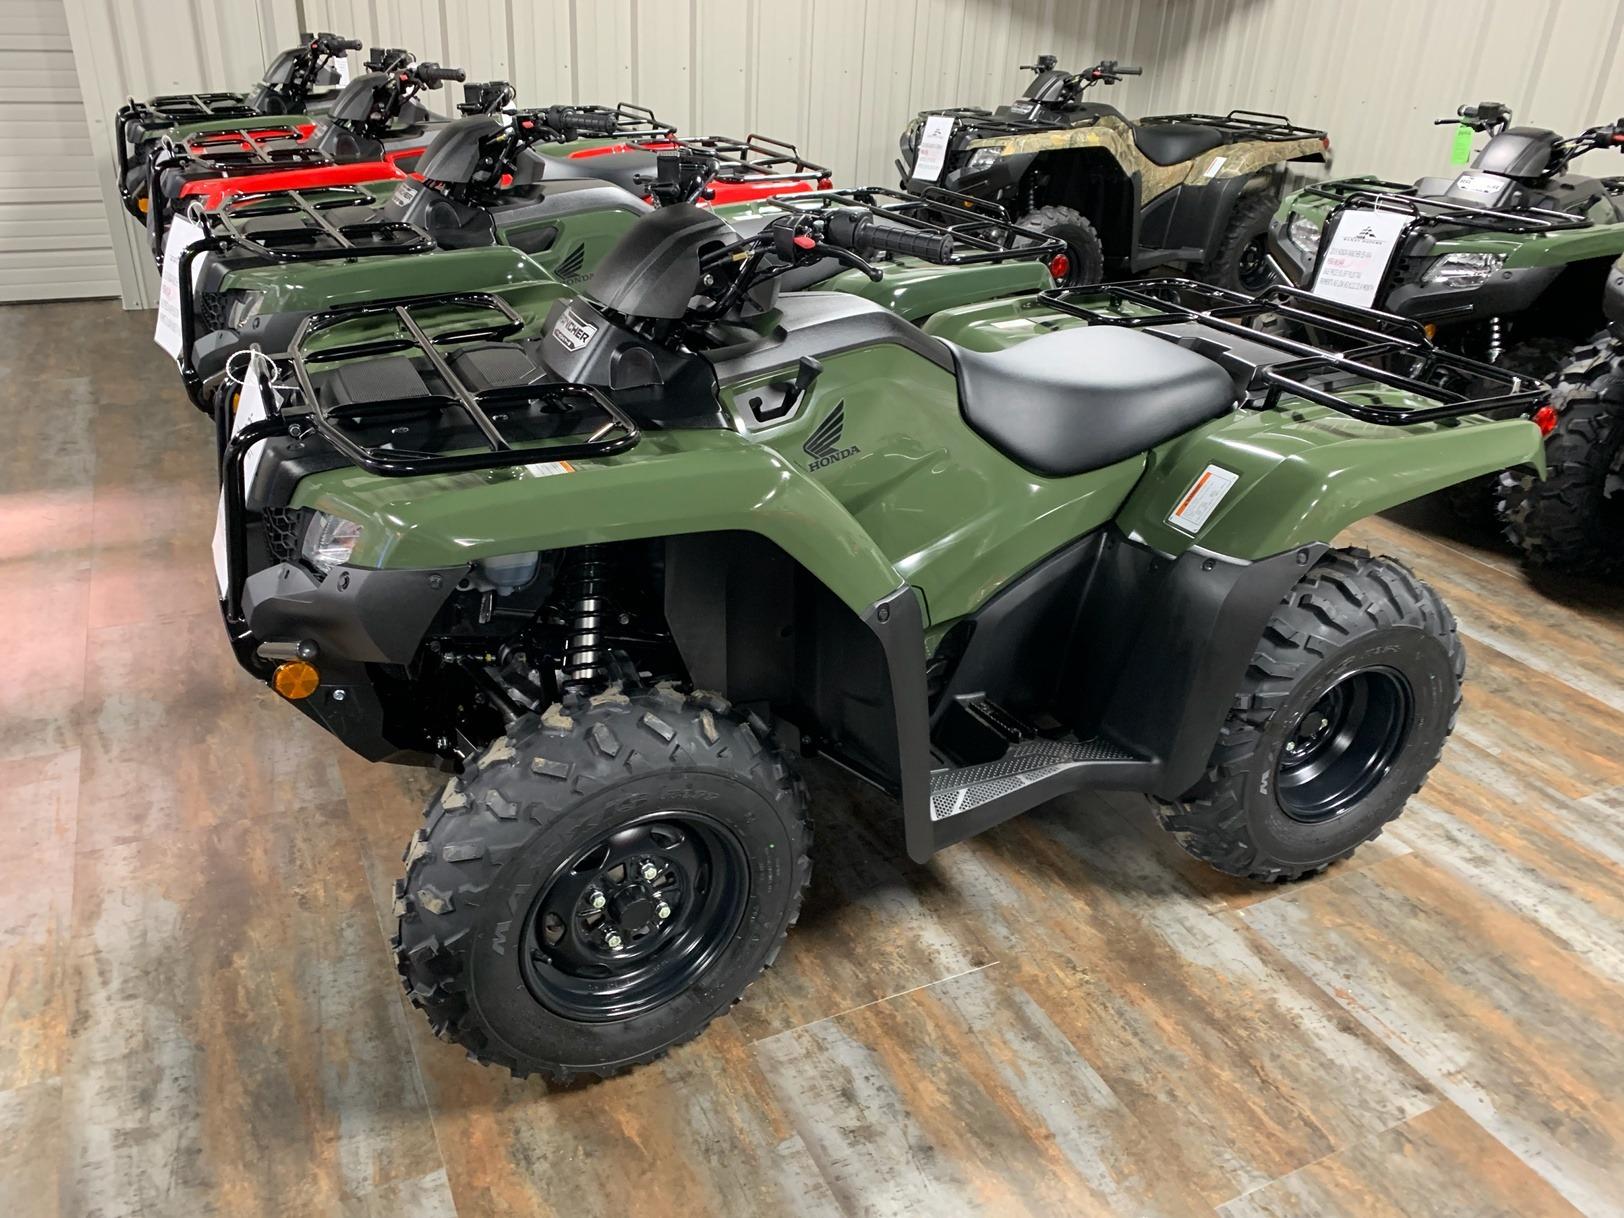 2019 Honda FourTrax Rancher 4x4 in Purvis, Mississippi